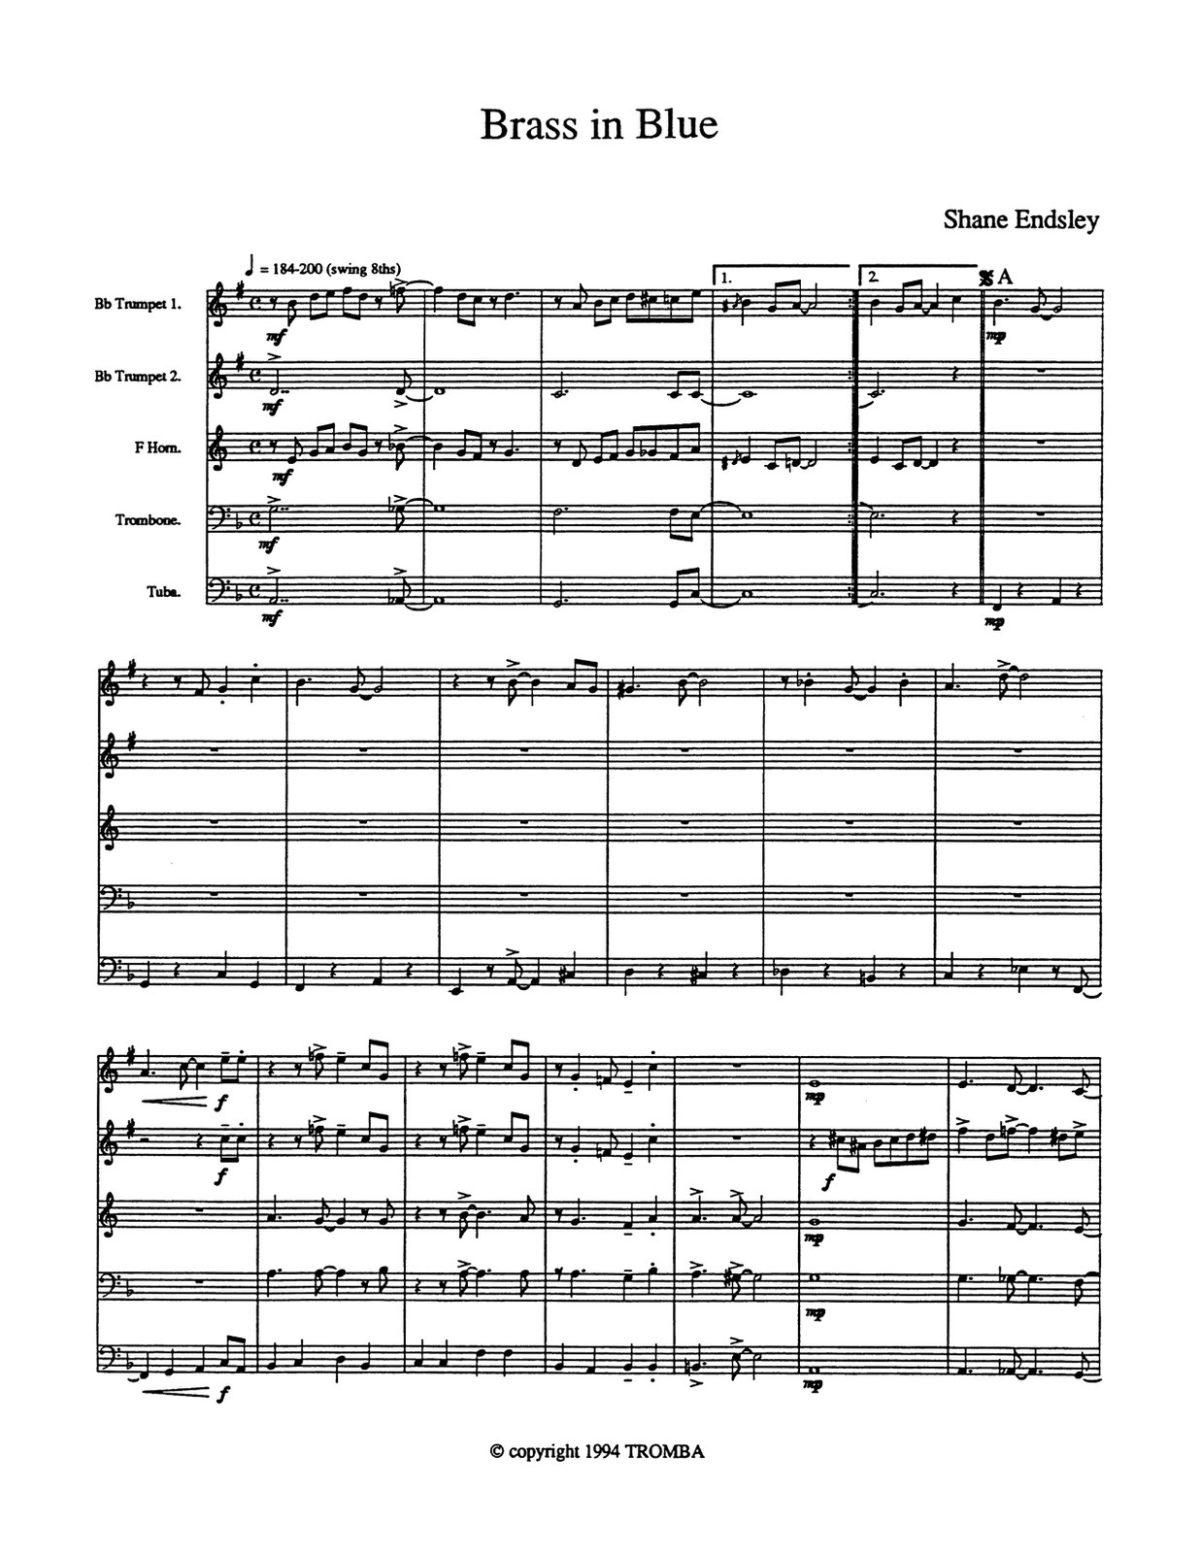 Endsley, Brass in Blue-p13